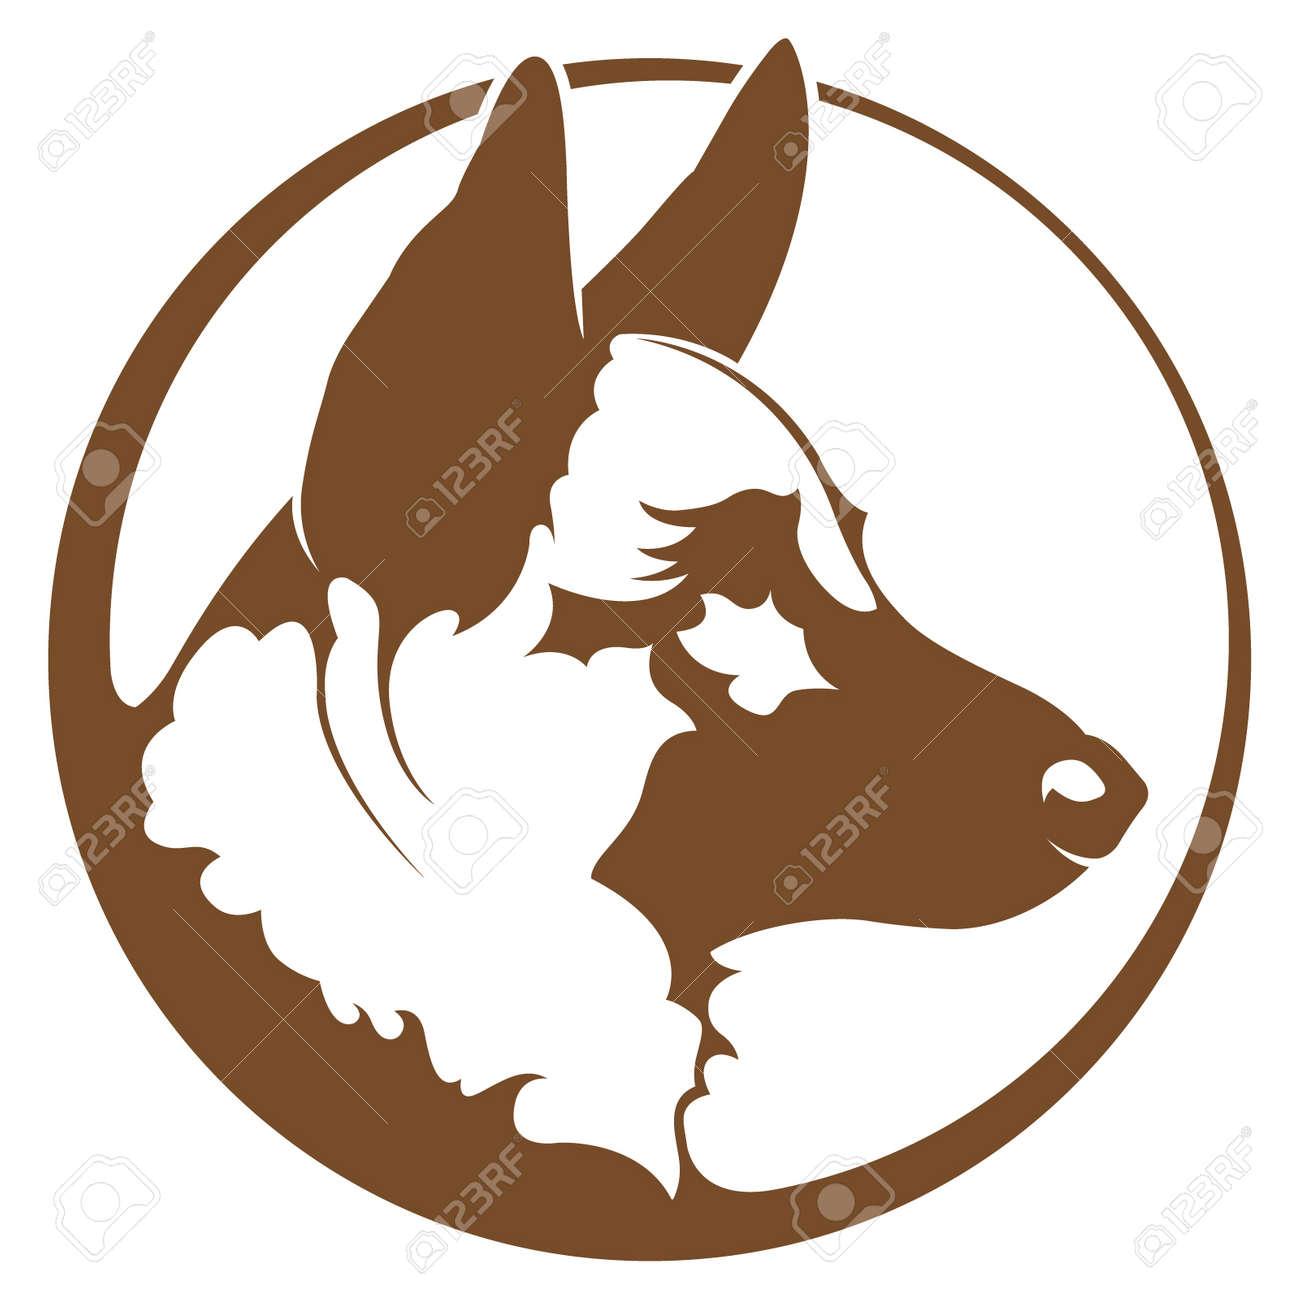 german shepherd royalty free cliparts vectors and stock rh 123rf com